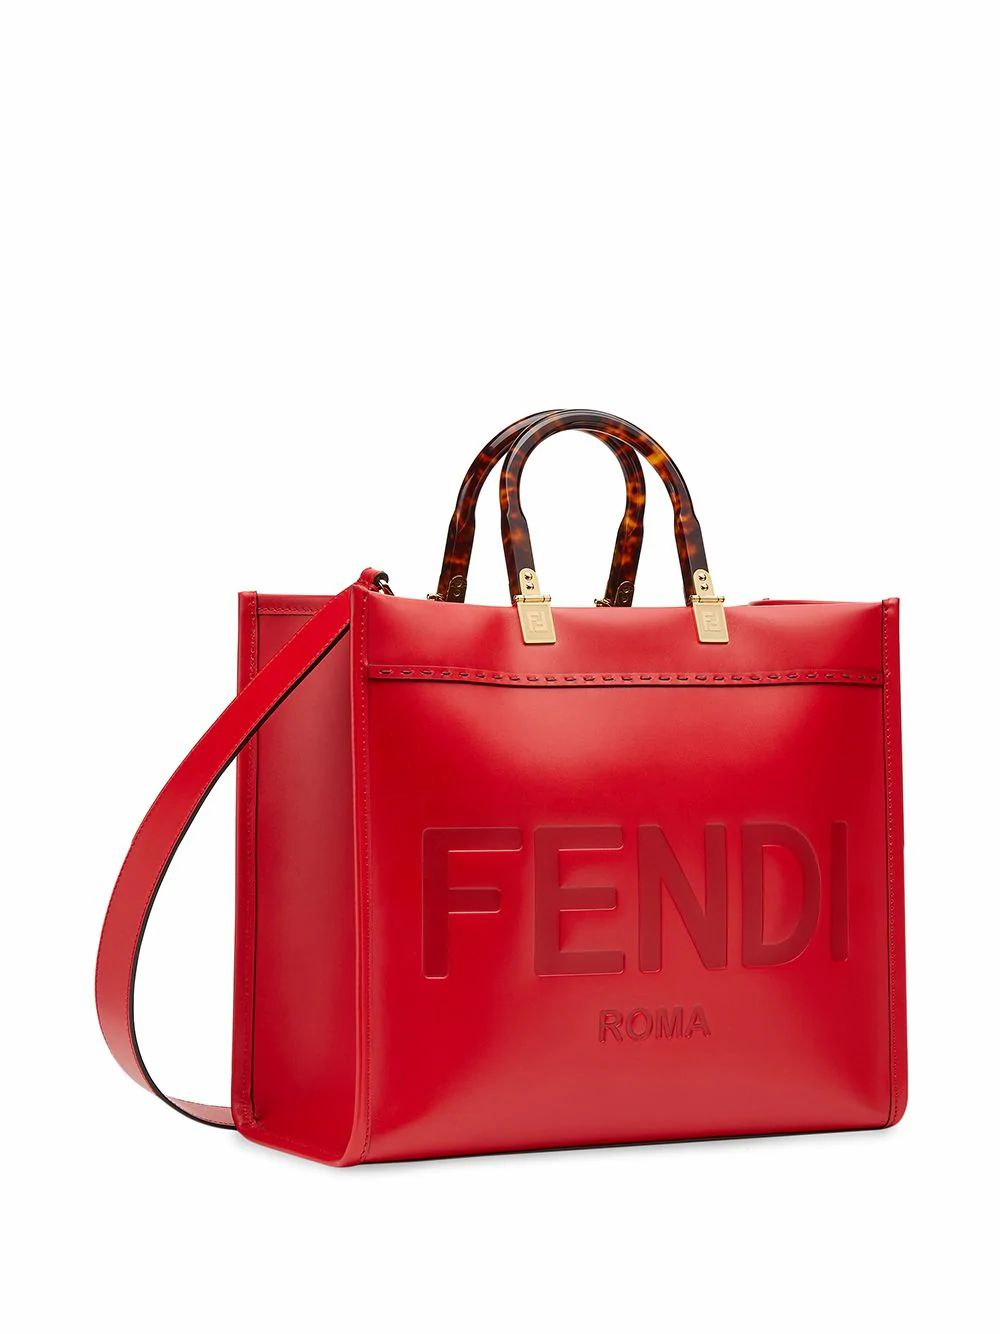 FENDI Leathers FENDI WOMEN'S RED LEATHER HANDBAG